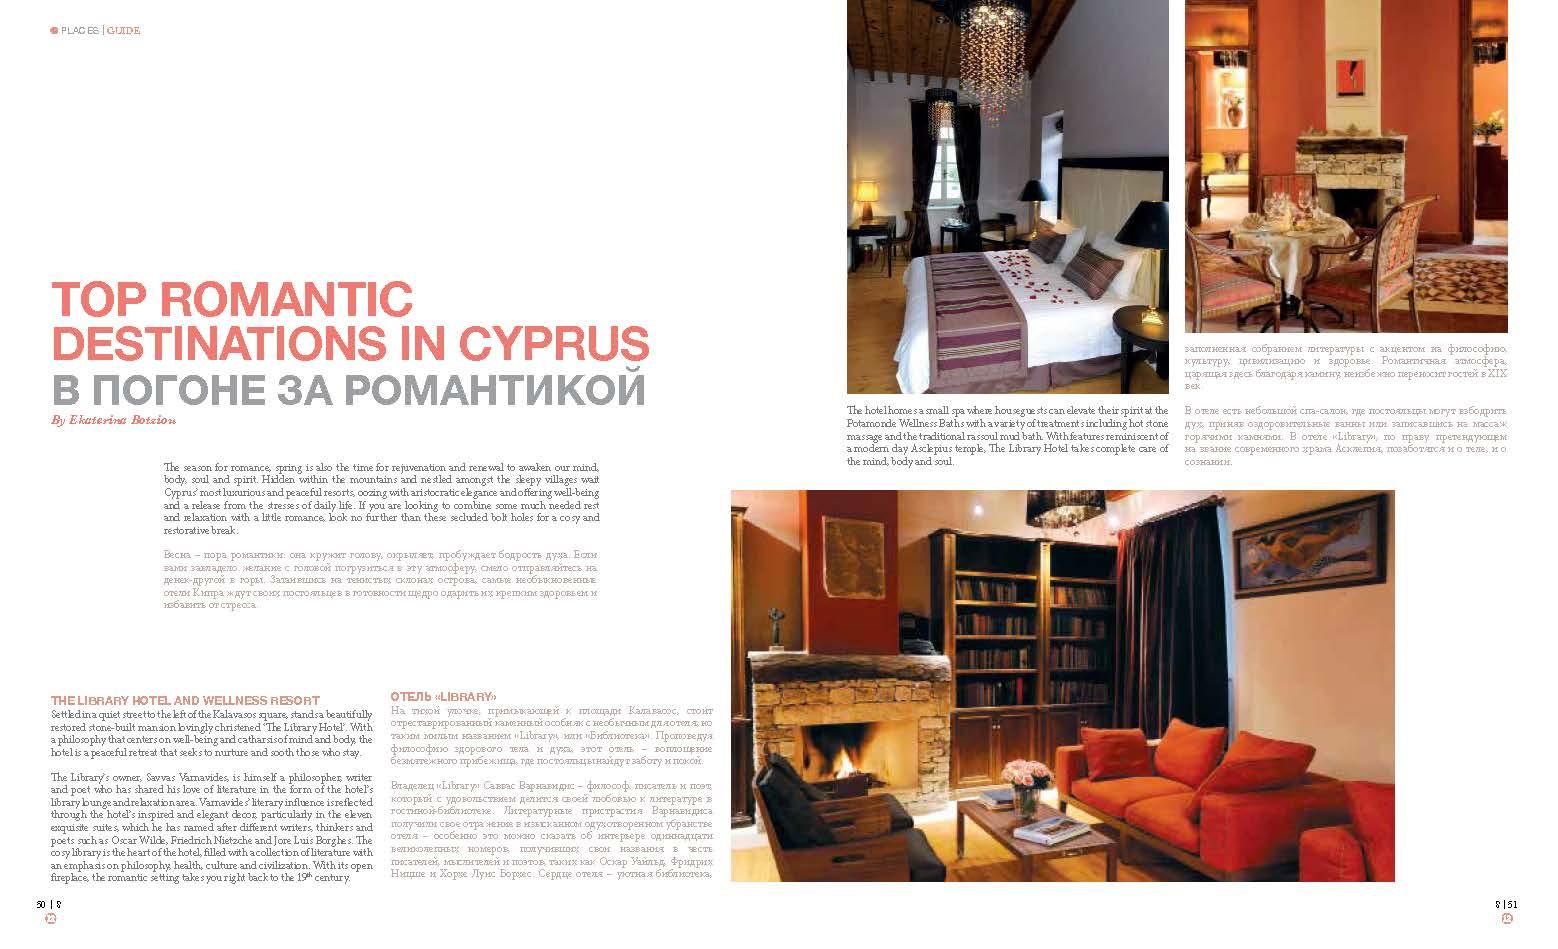 Top Romantic Destinations in Cyprus